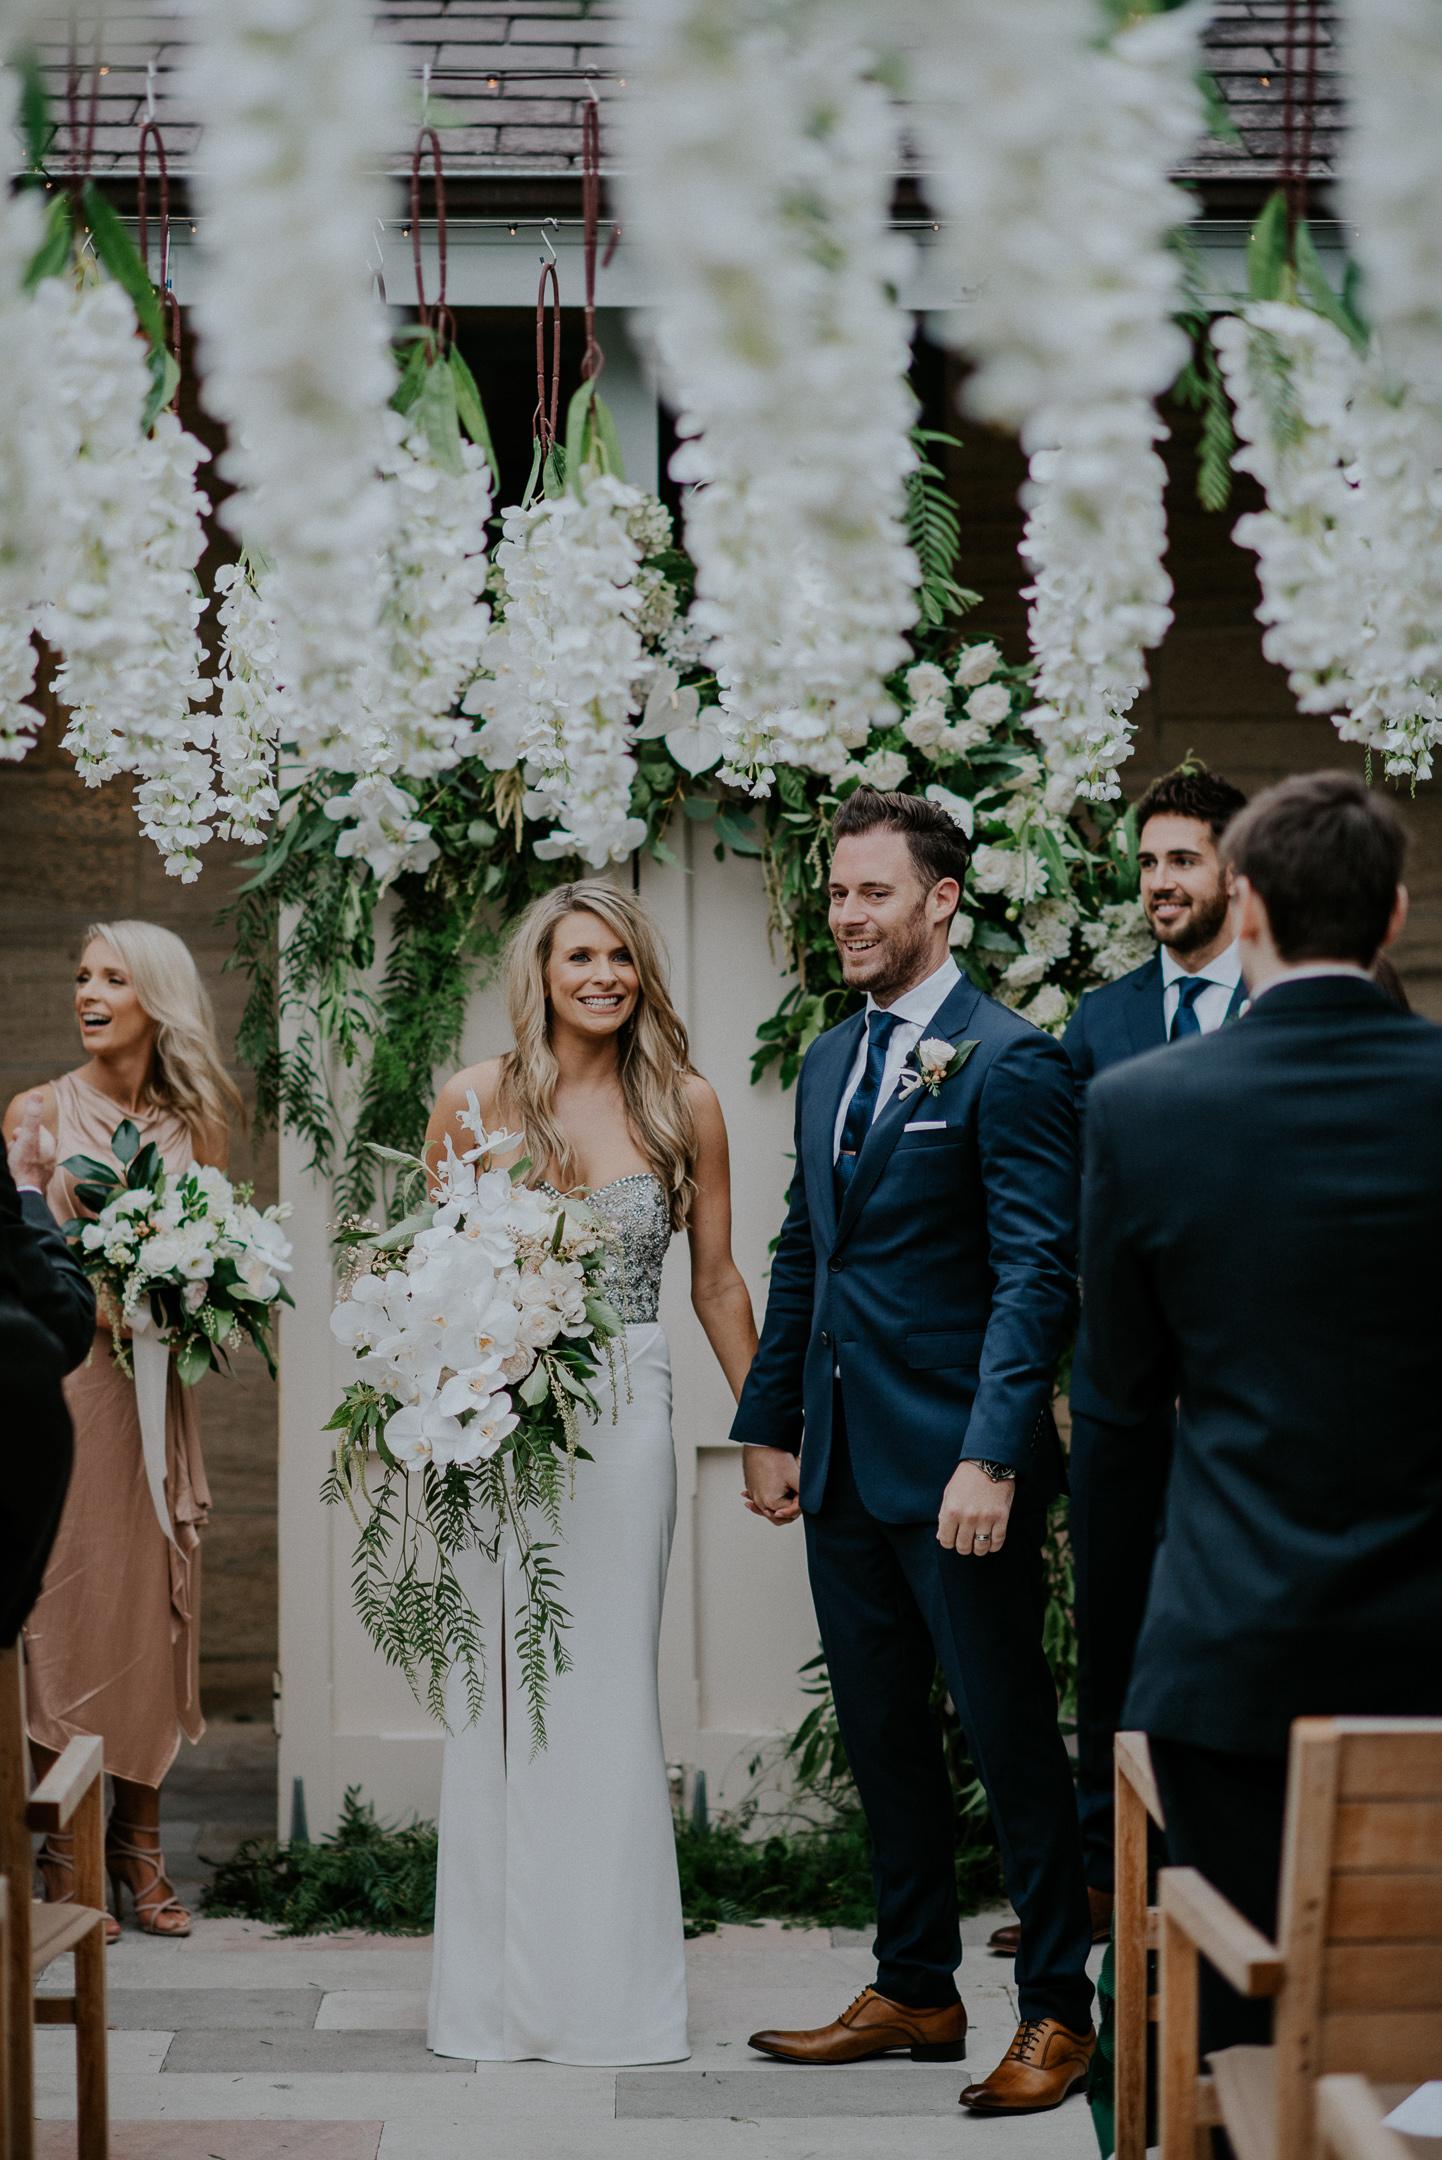 Gunners Barracks wedding styling flowers